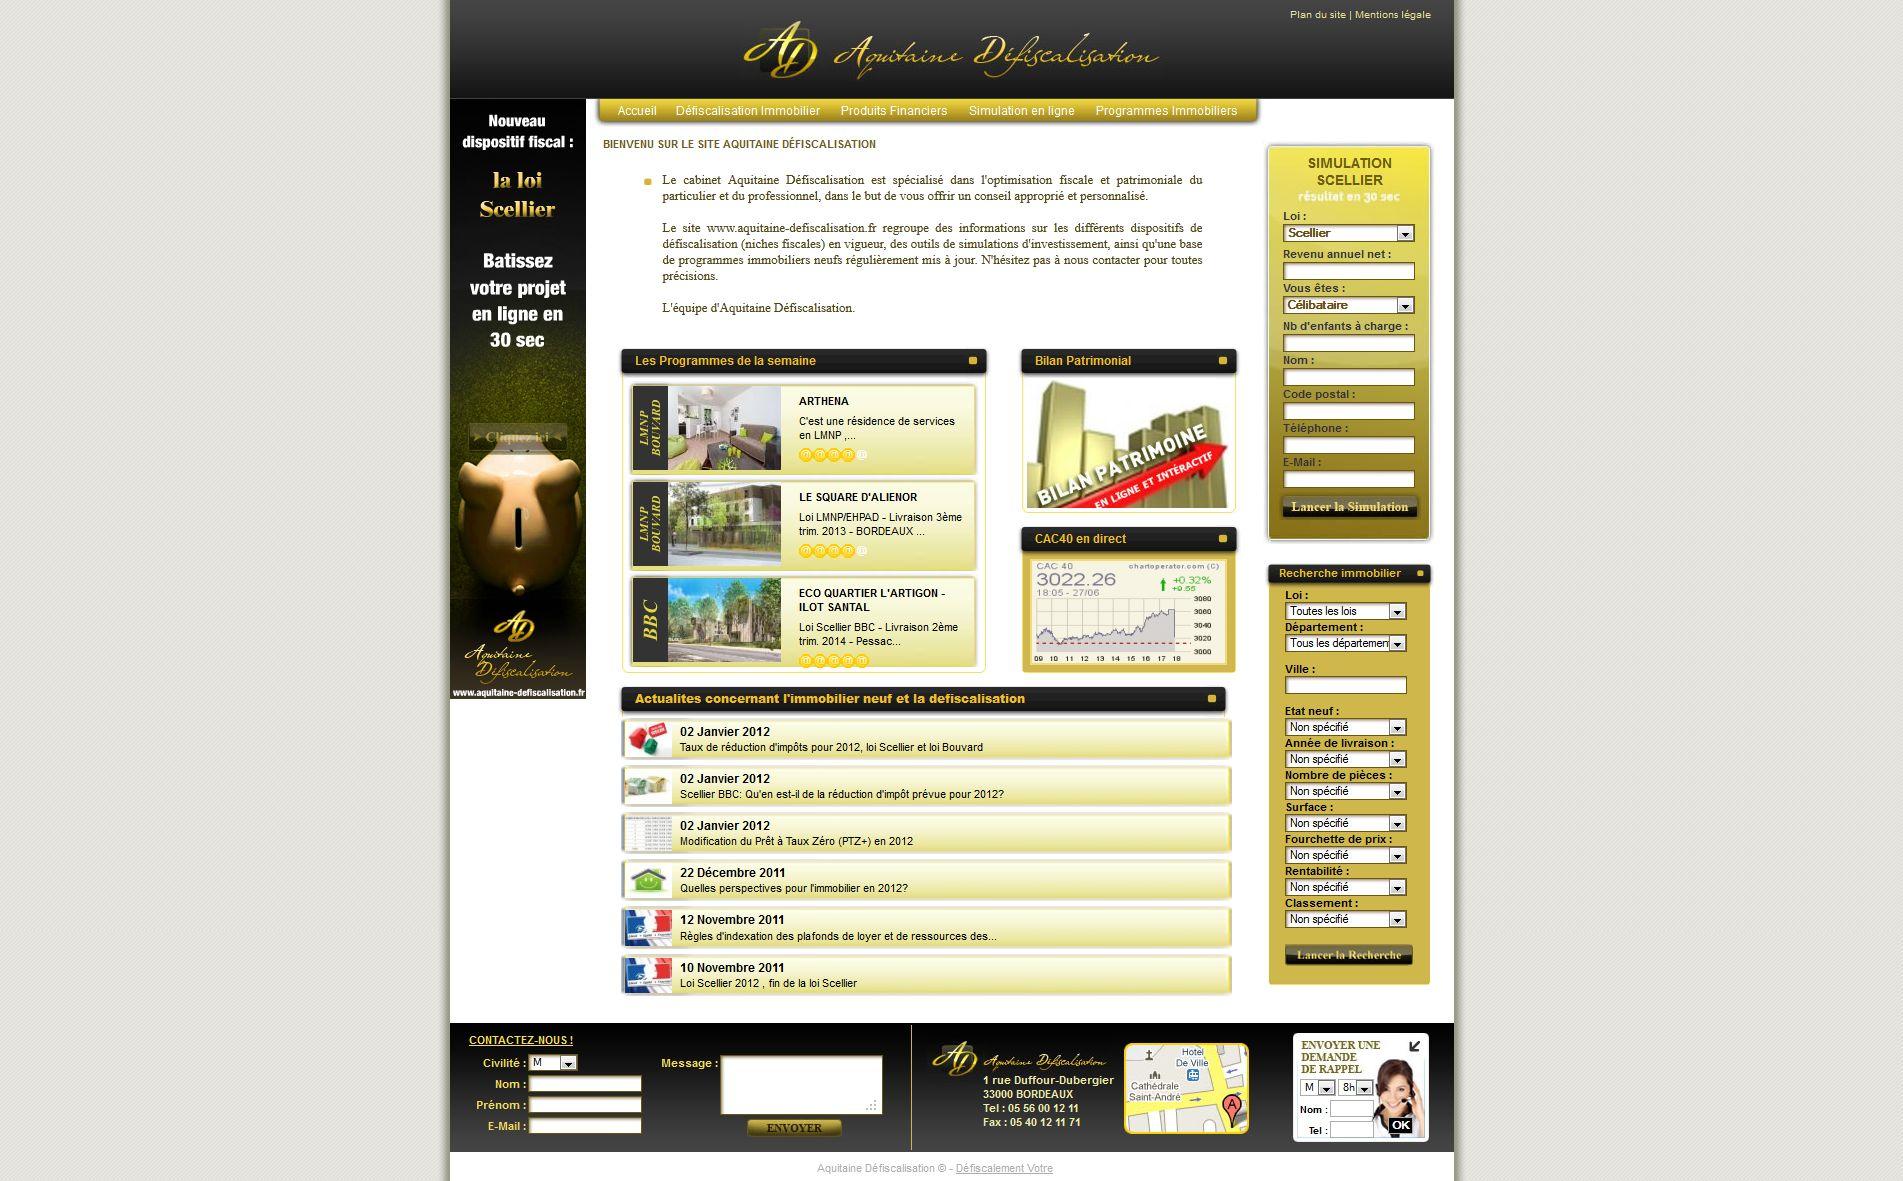 Aquitaine Desfiscalisation